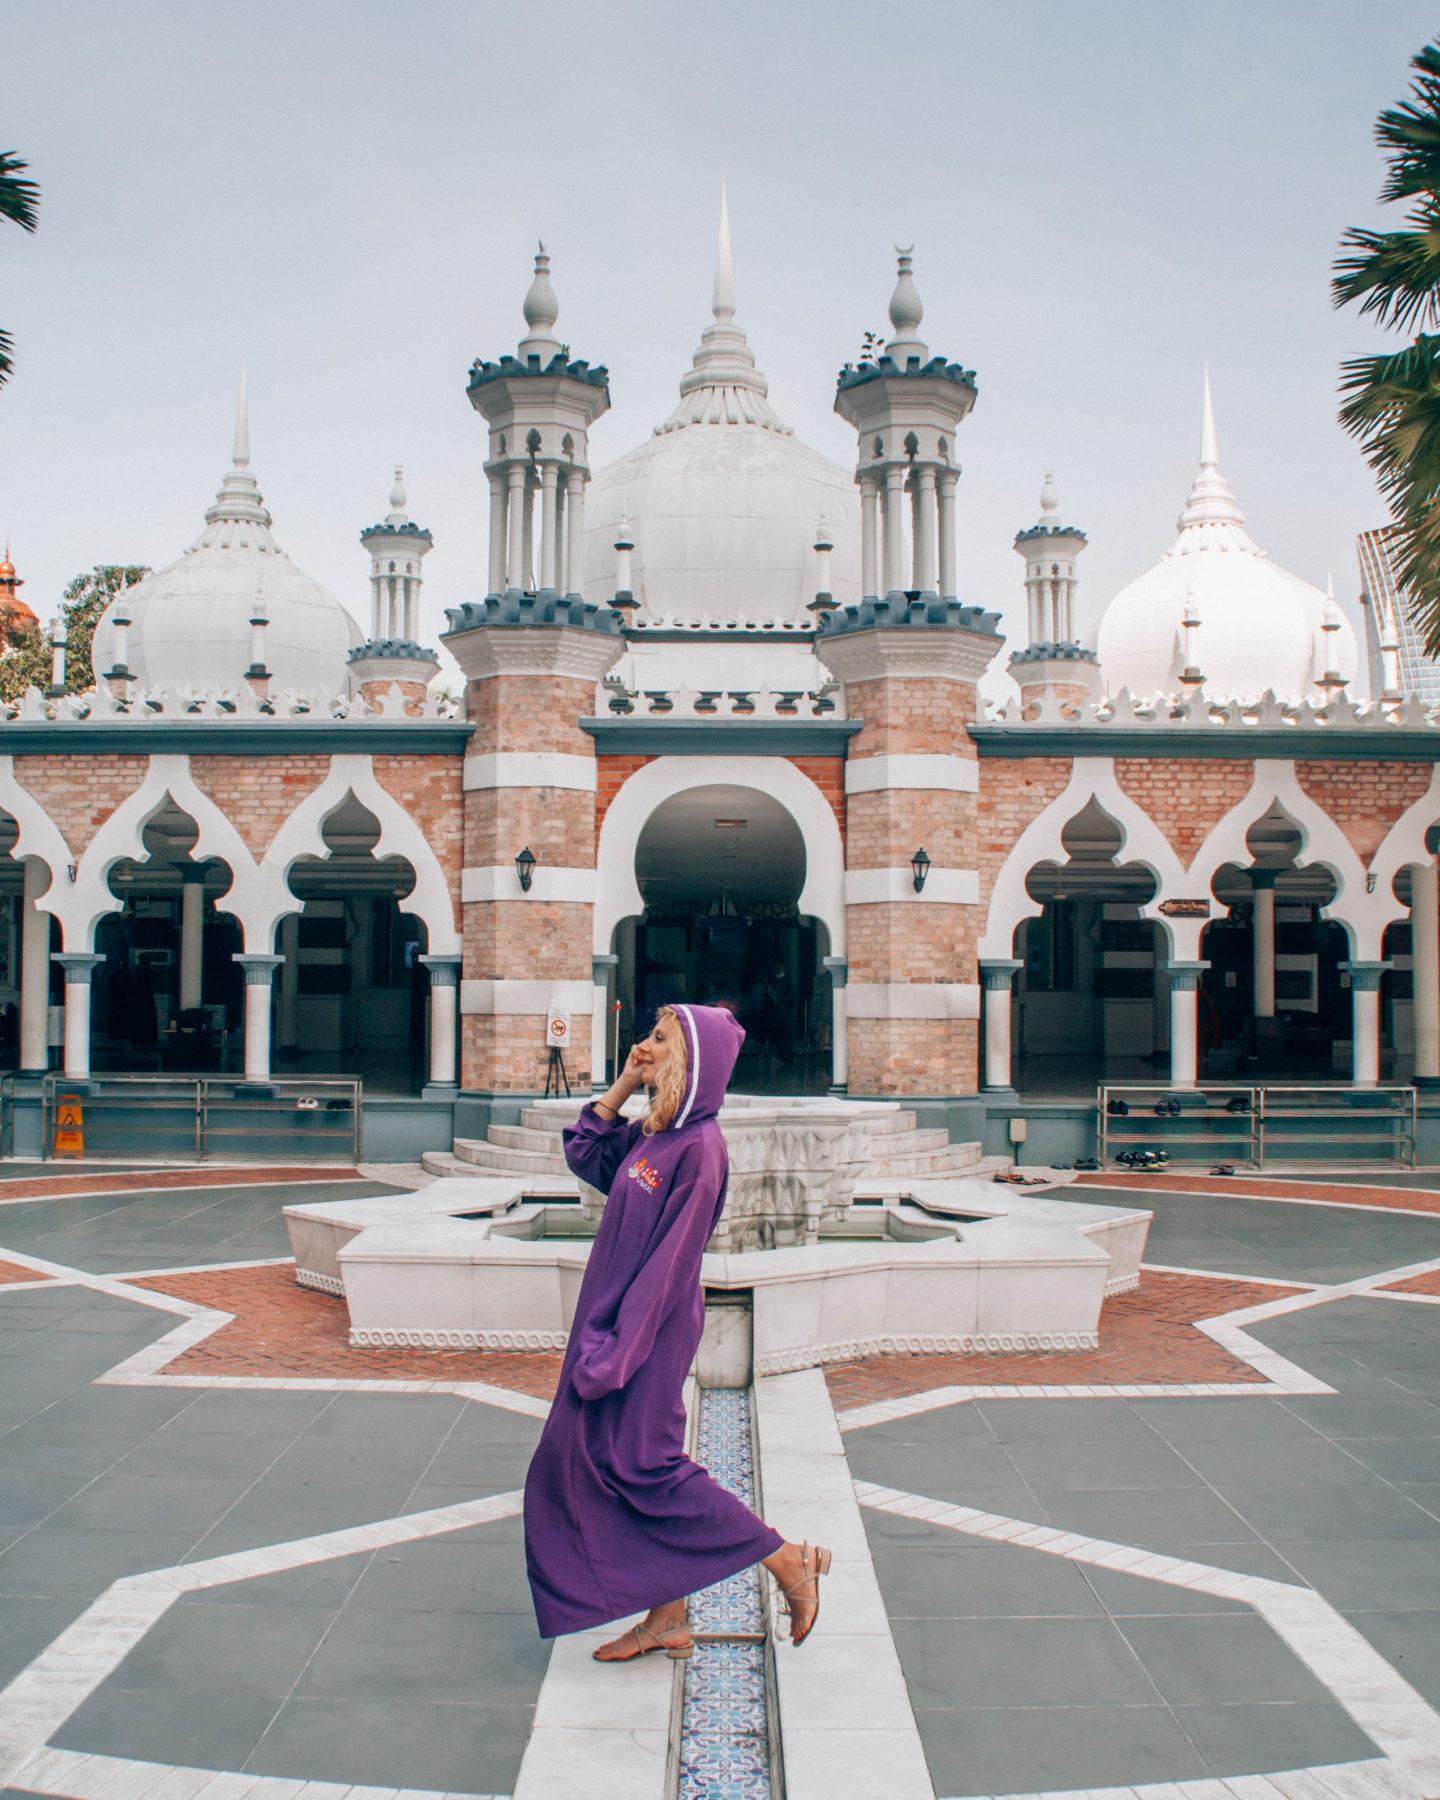 Masjid Jamek, the most ancient mosque of Kuala Lumpur